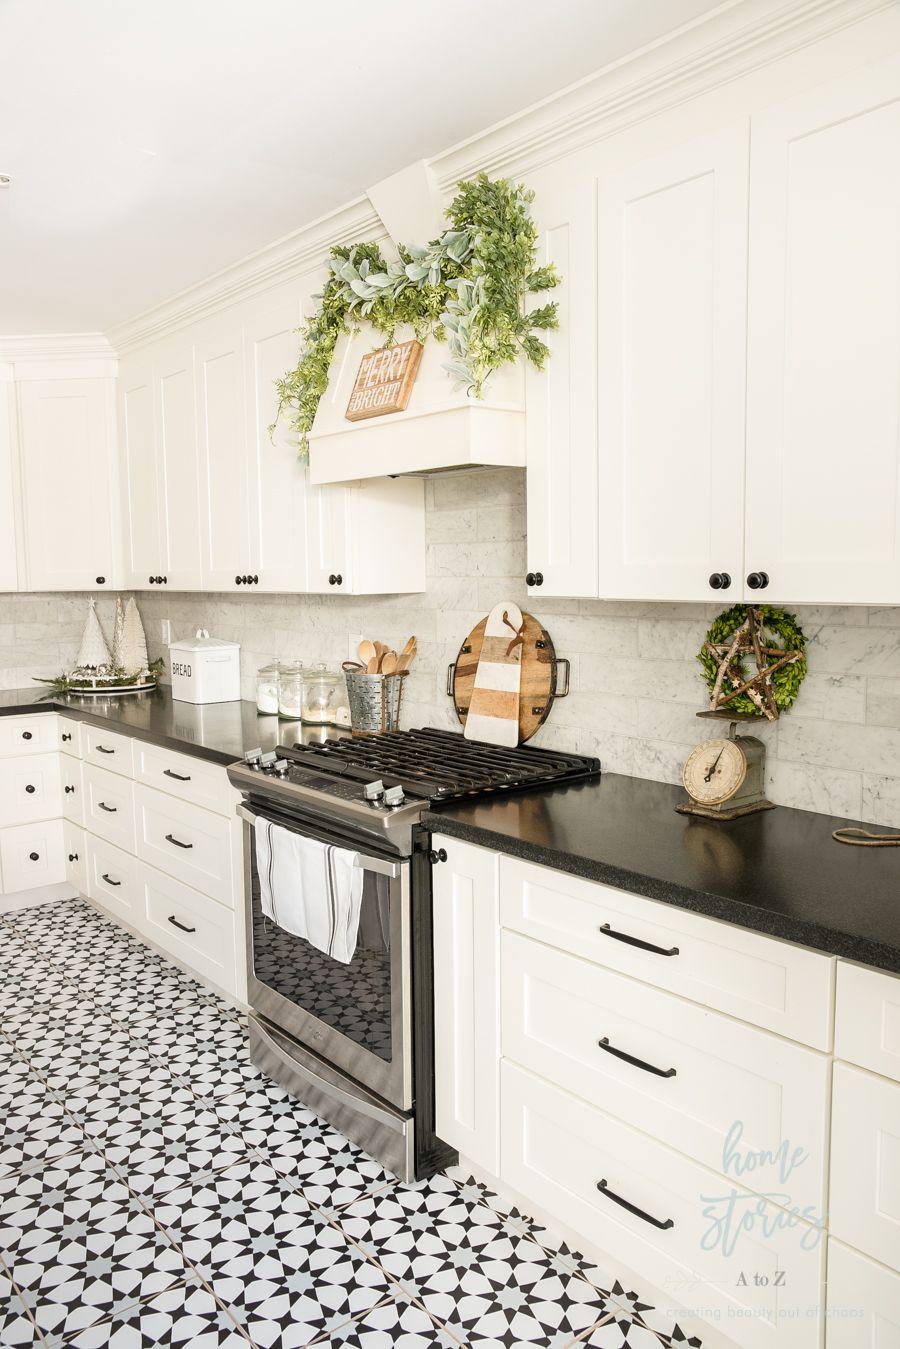 pin by patti boor on kitchen kitchen inspirations retro kitchen kitchen redo on farmhouse kitchen black and white id=29851